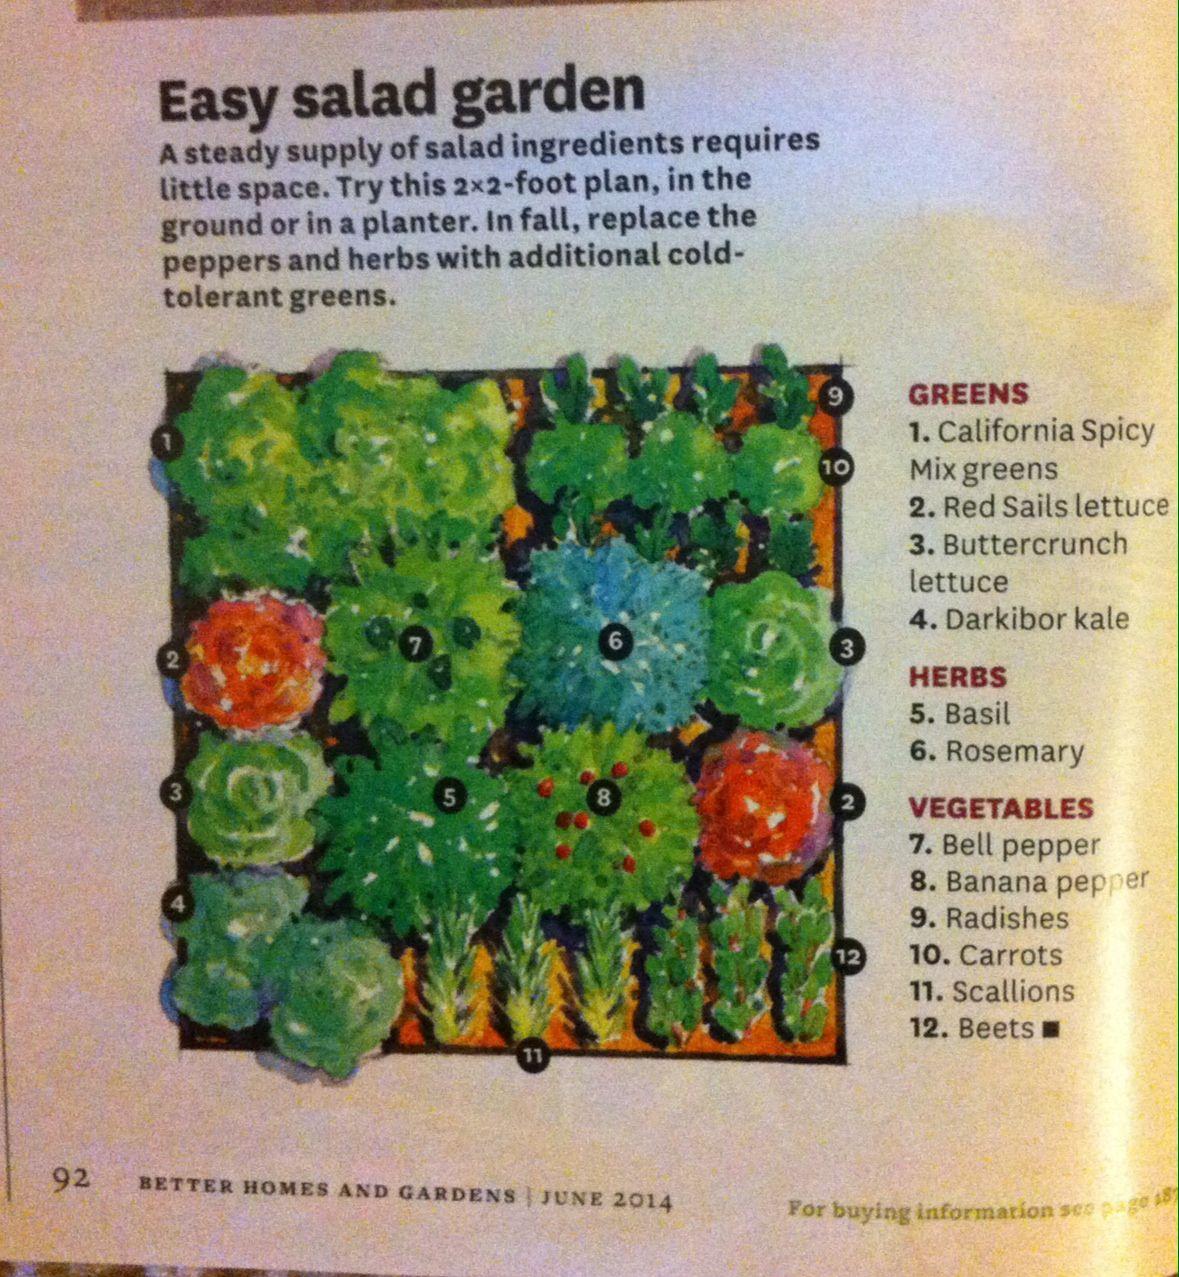 Bhg 2x2 Container Salad Garden Plan Buttercrunch Lettuce Easy Garden Mixed Greens